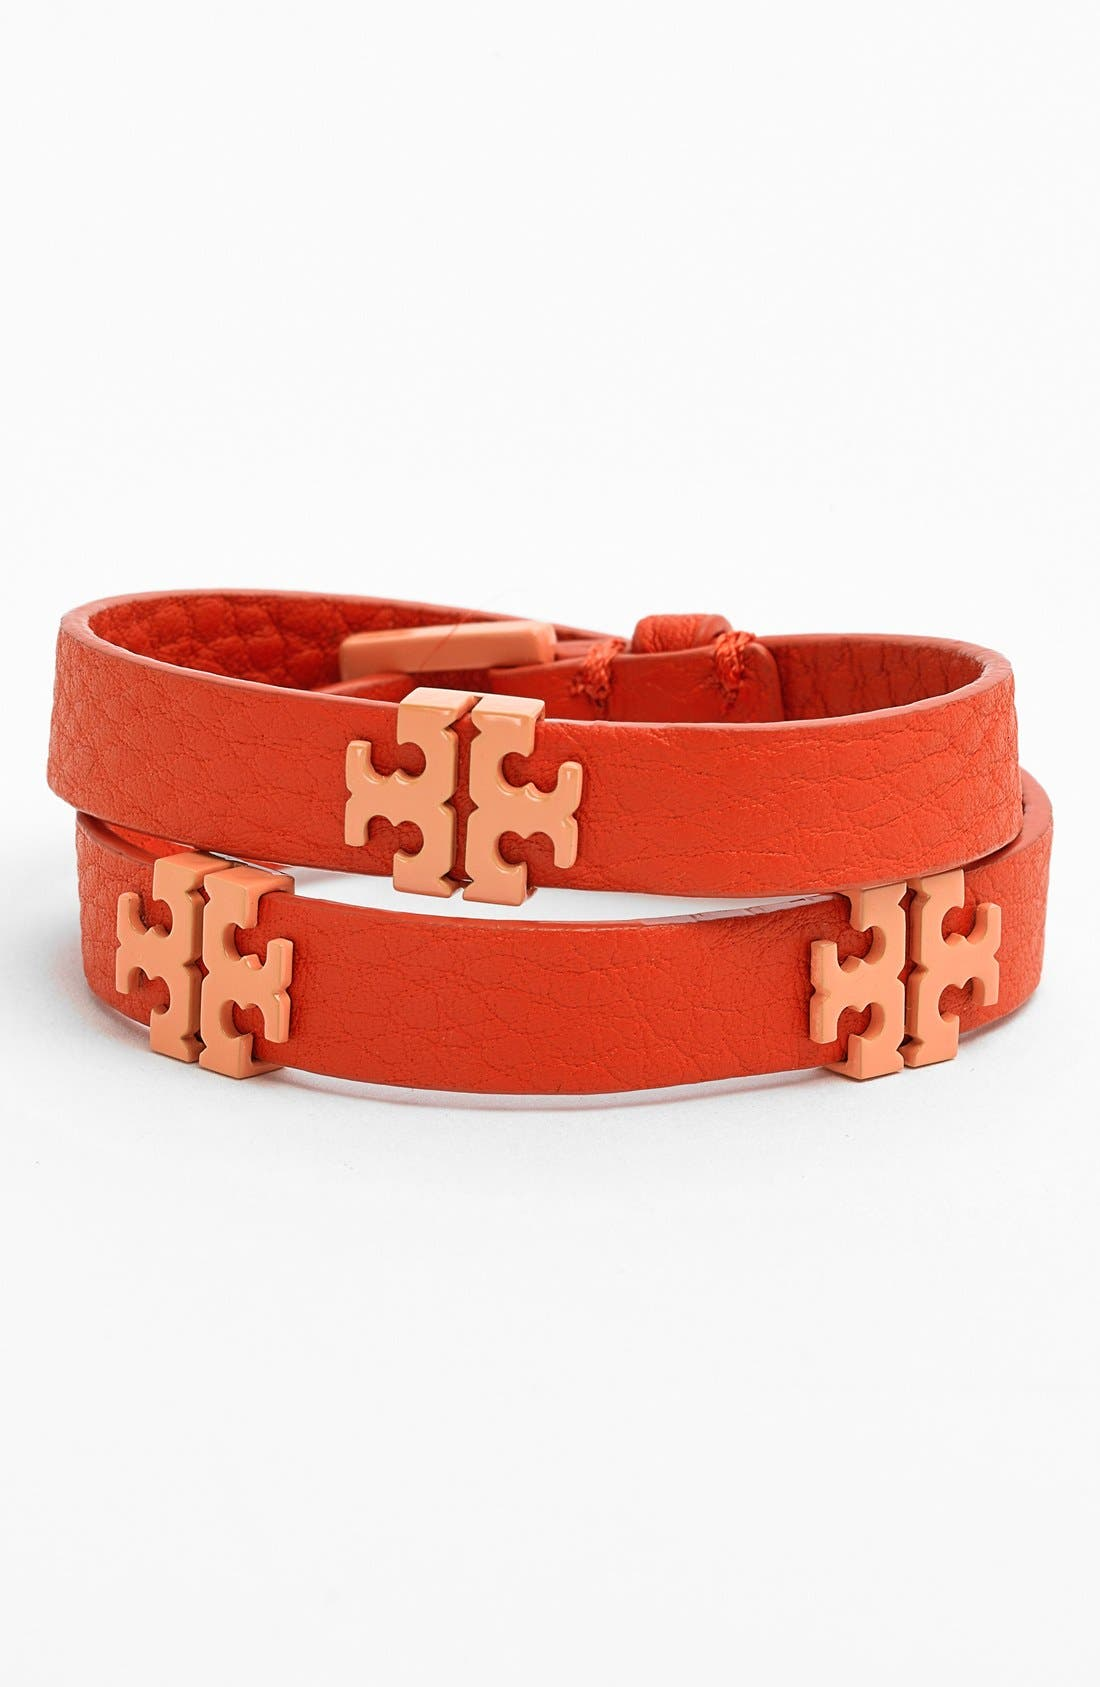 Alternate Image 1 Selected - Tory Burch 'Mini T' Leather Wrap Bracelet